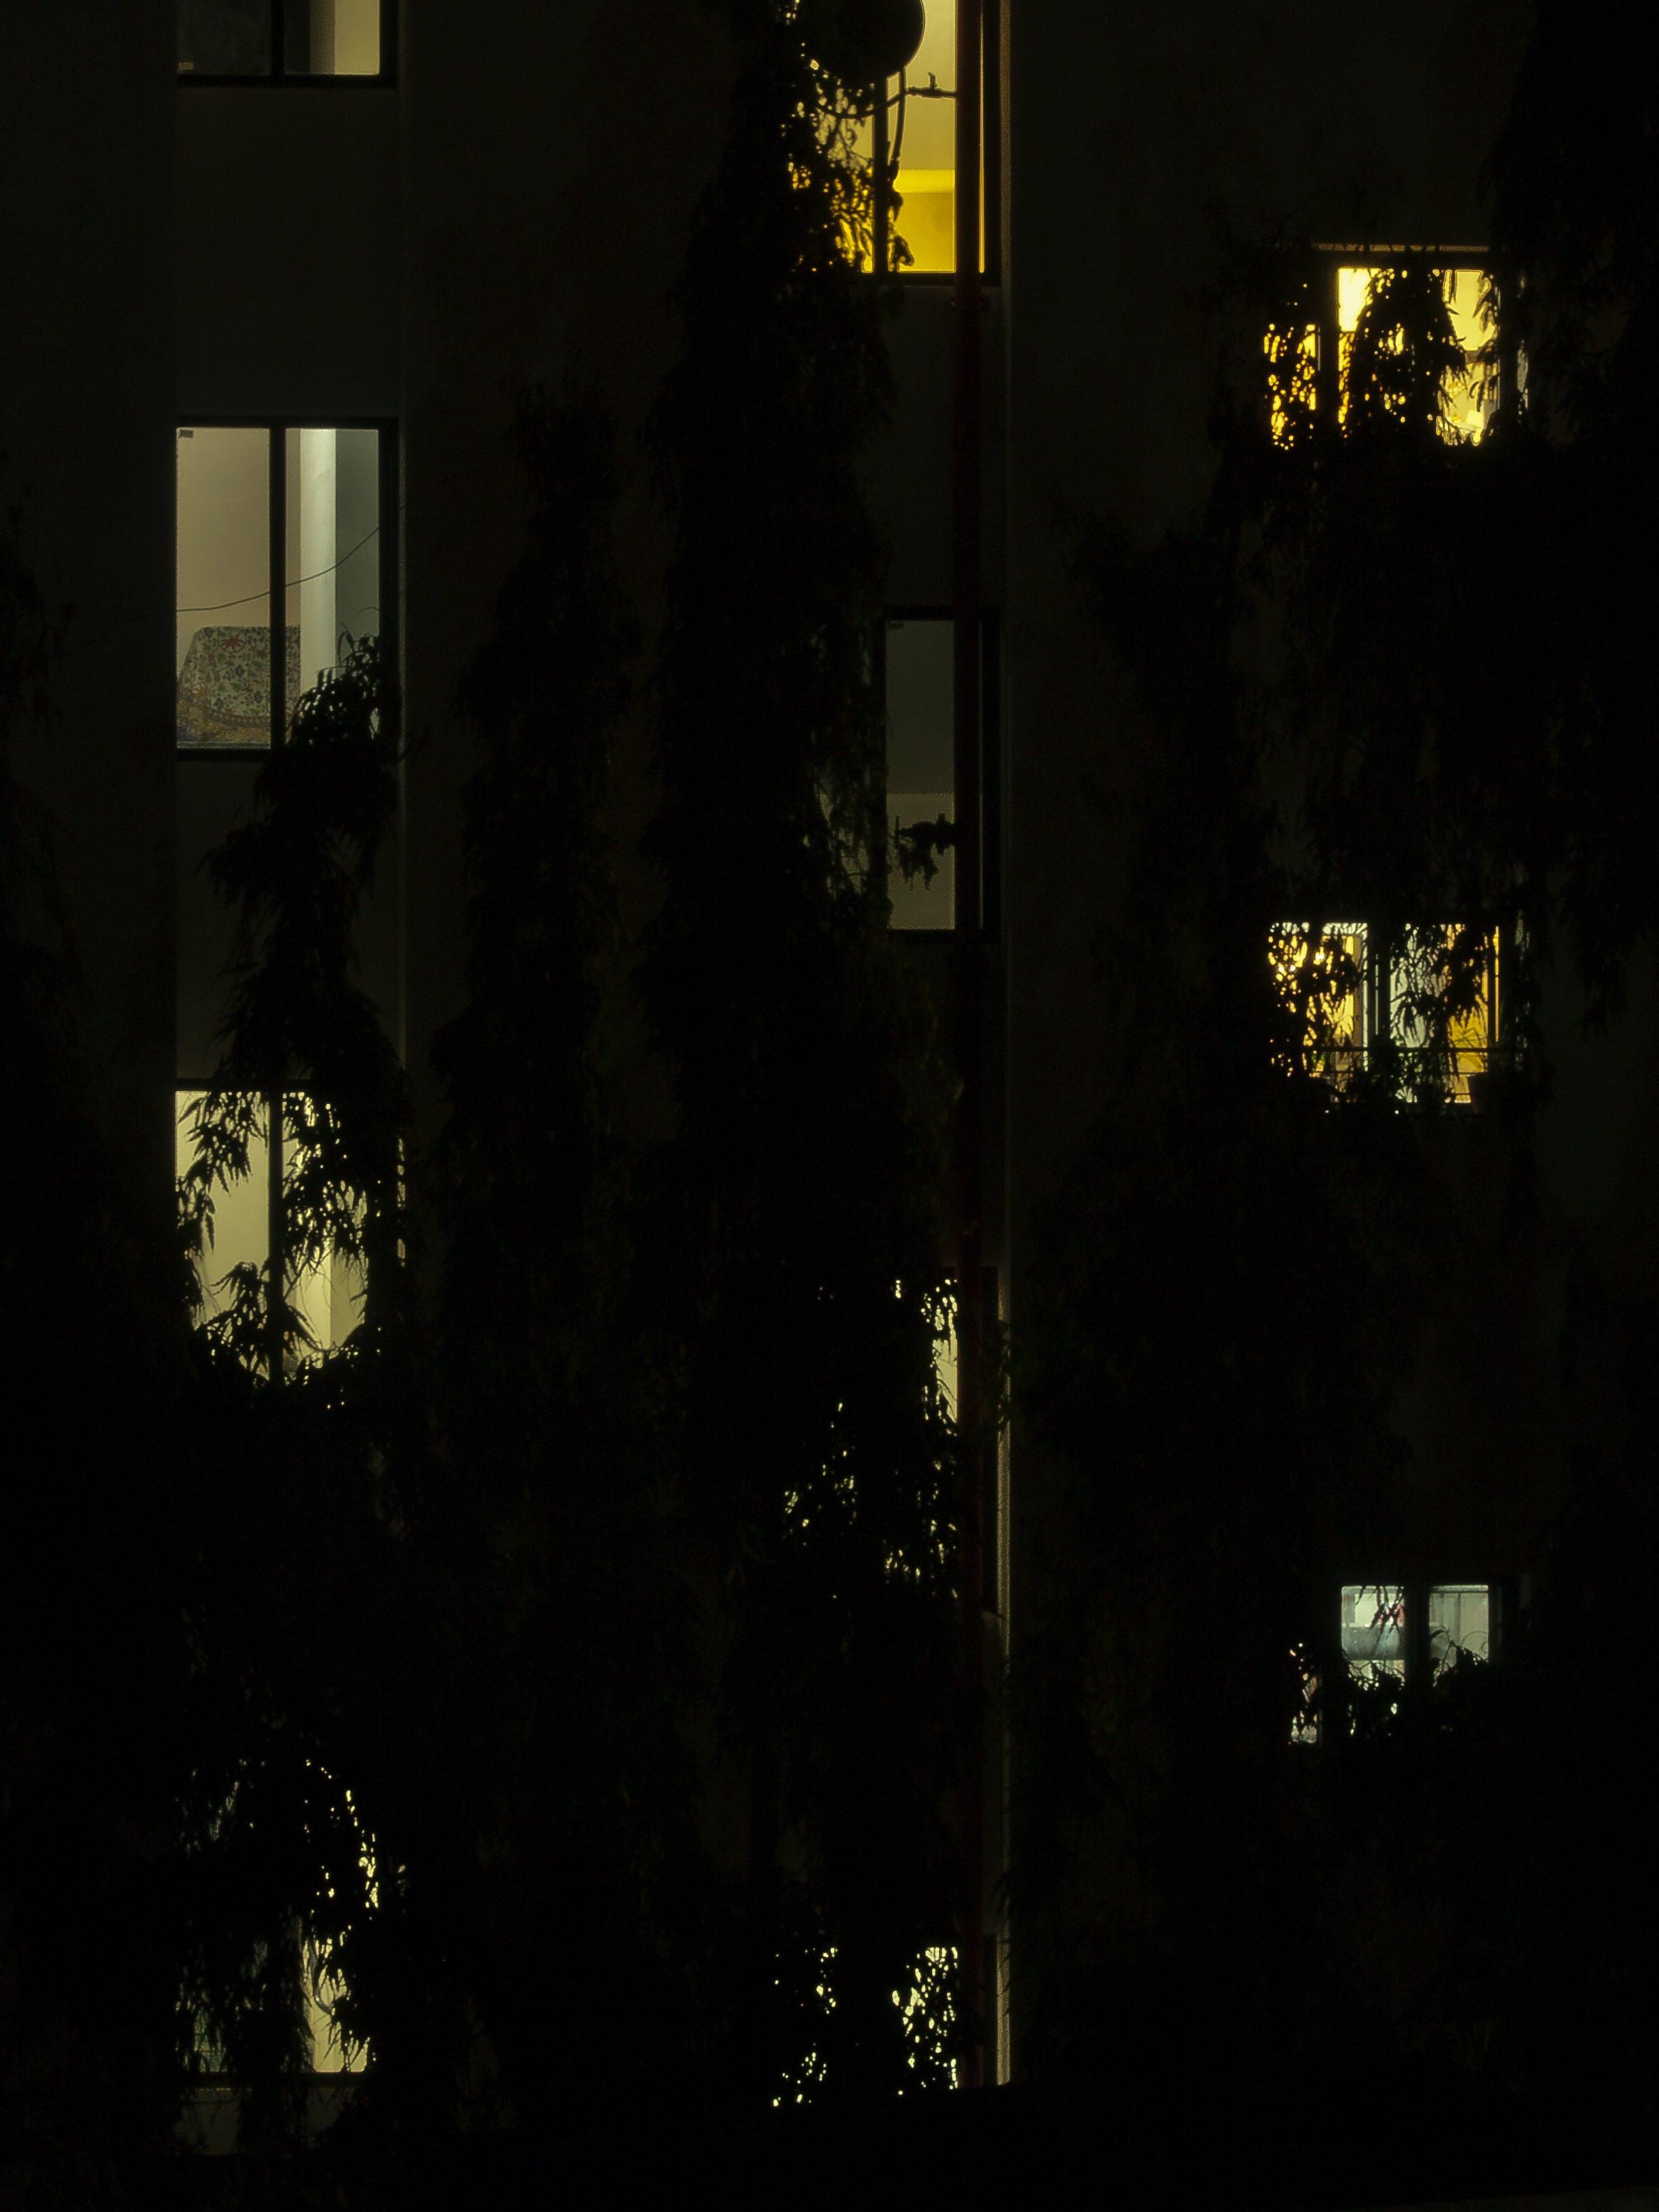 Free stock photo of night photography, urban, Urban nights